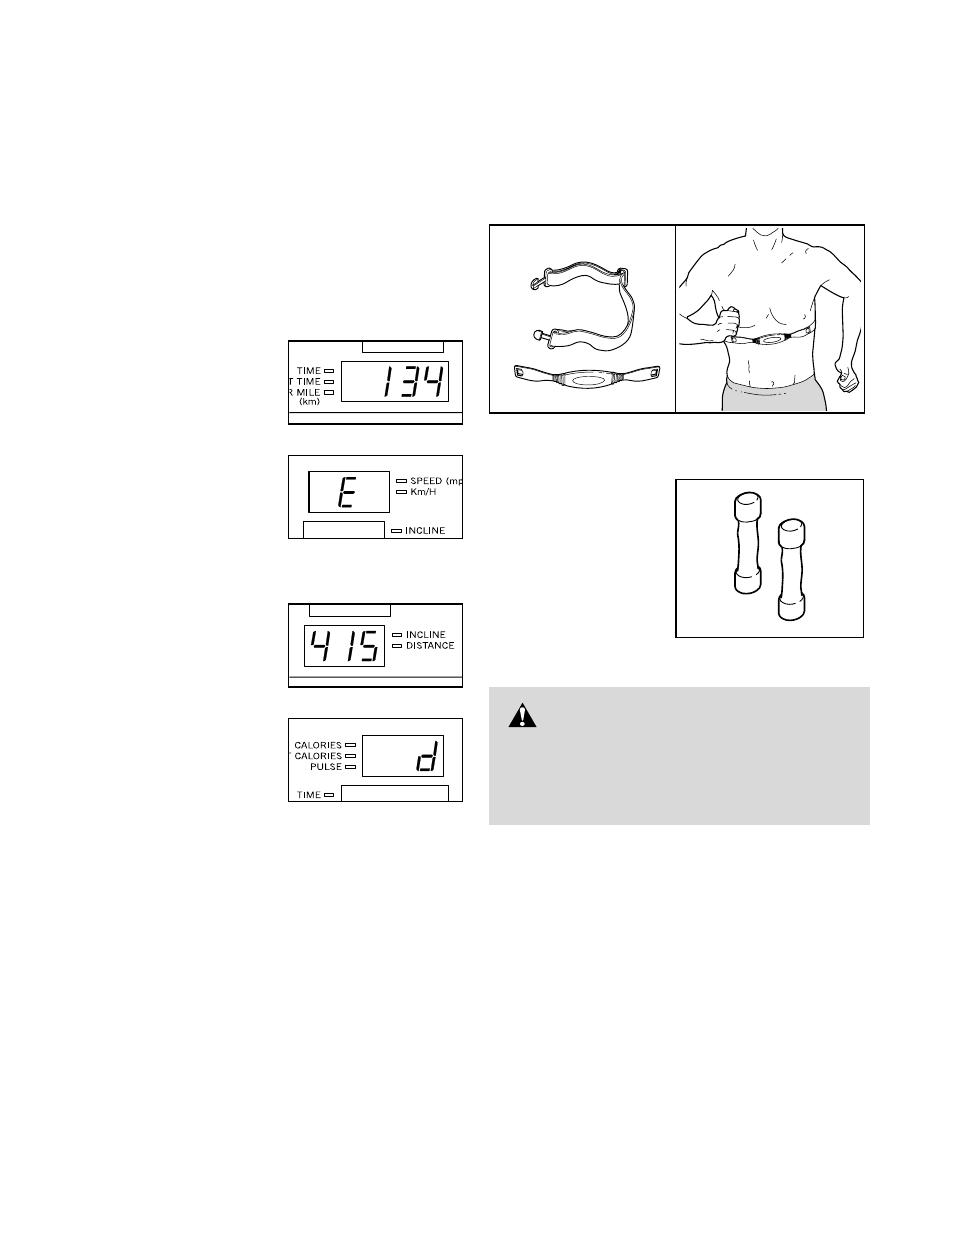 Warning | Healthrider T90 User Manual | Page 21 / 34